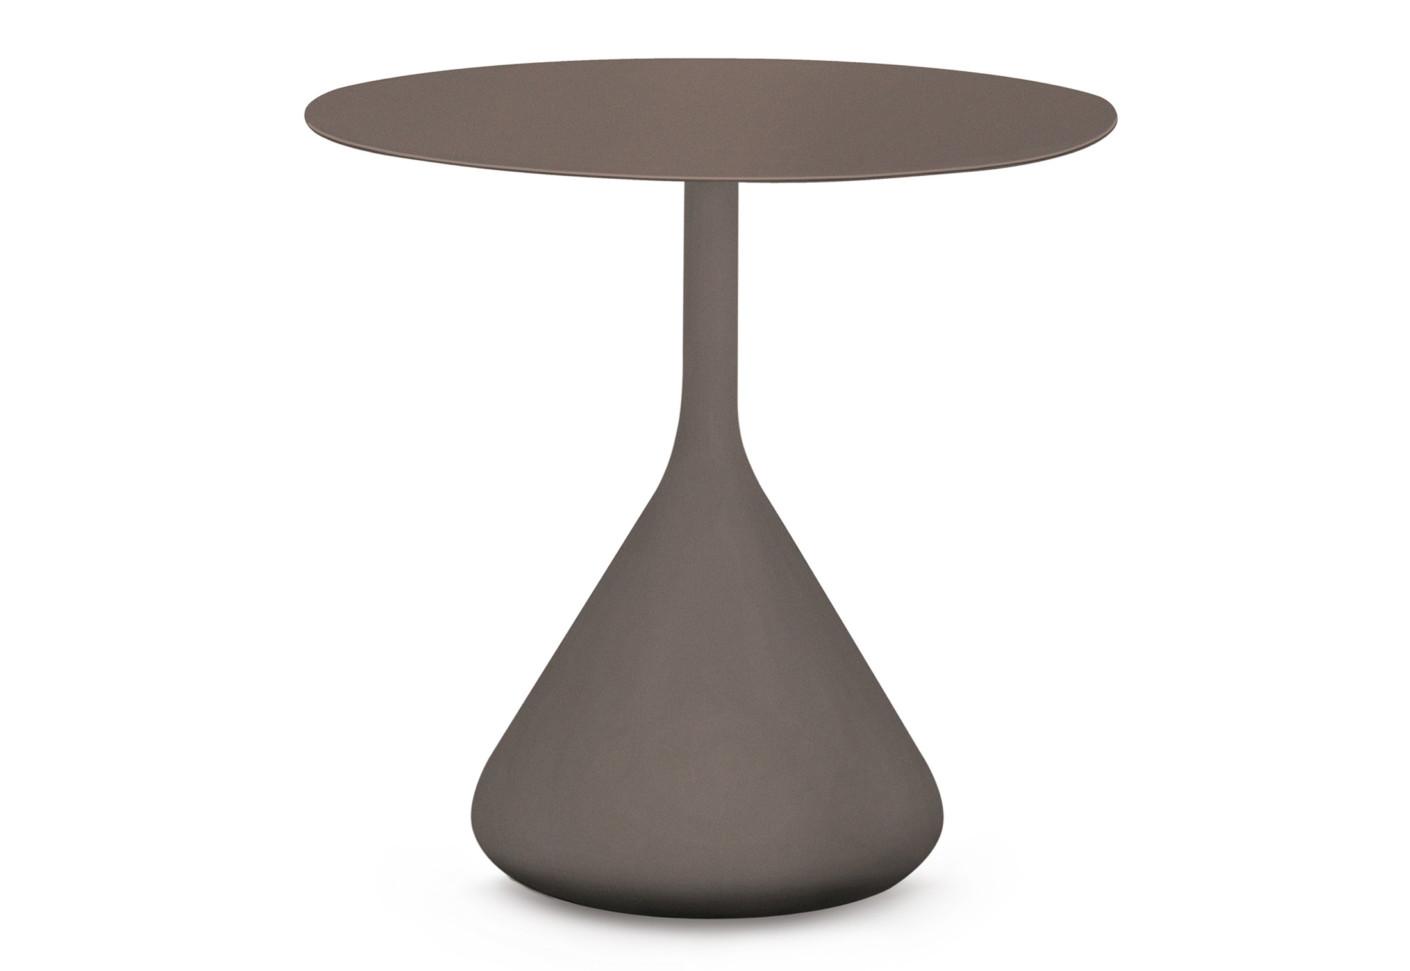 D Exhibition Designer Jobs In : Satellite side table round by dedon stylepark